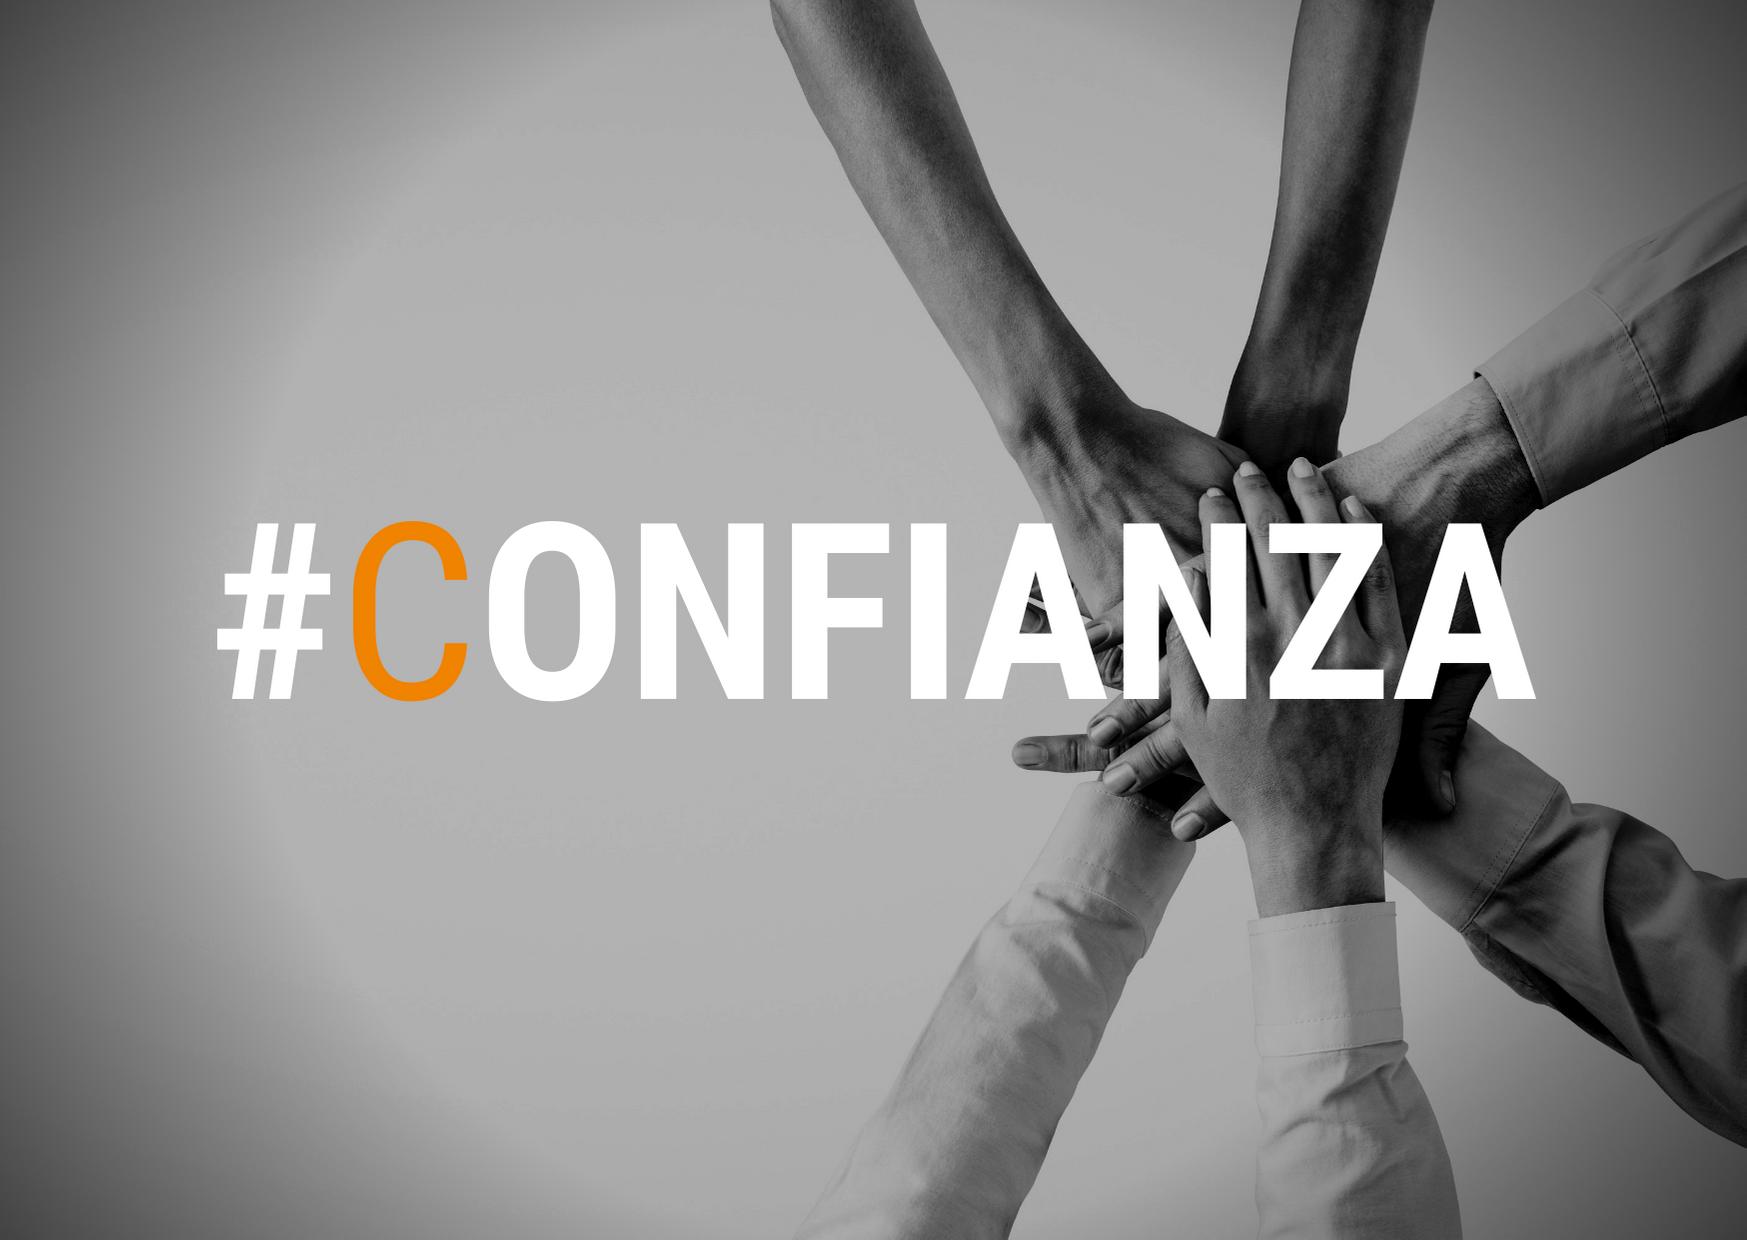 #Confianza